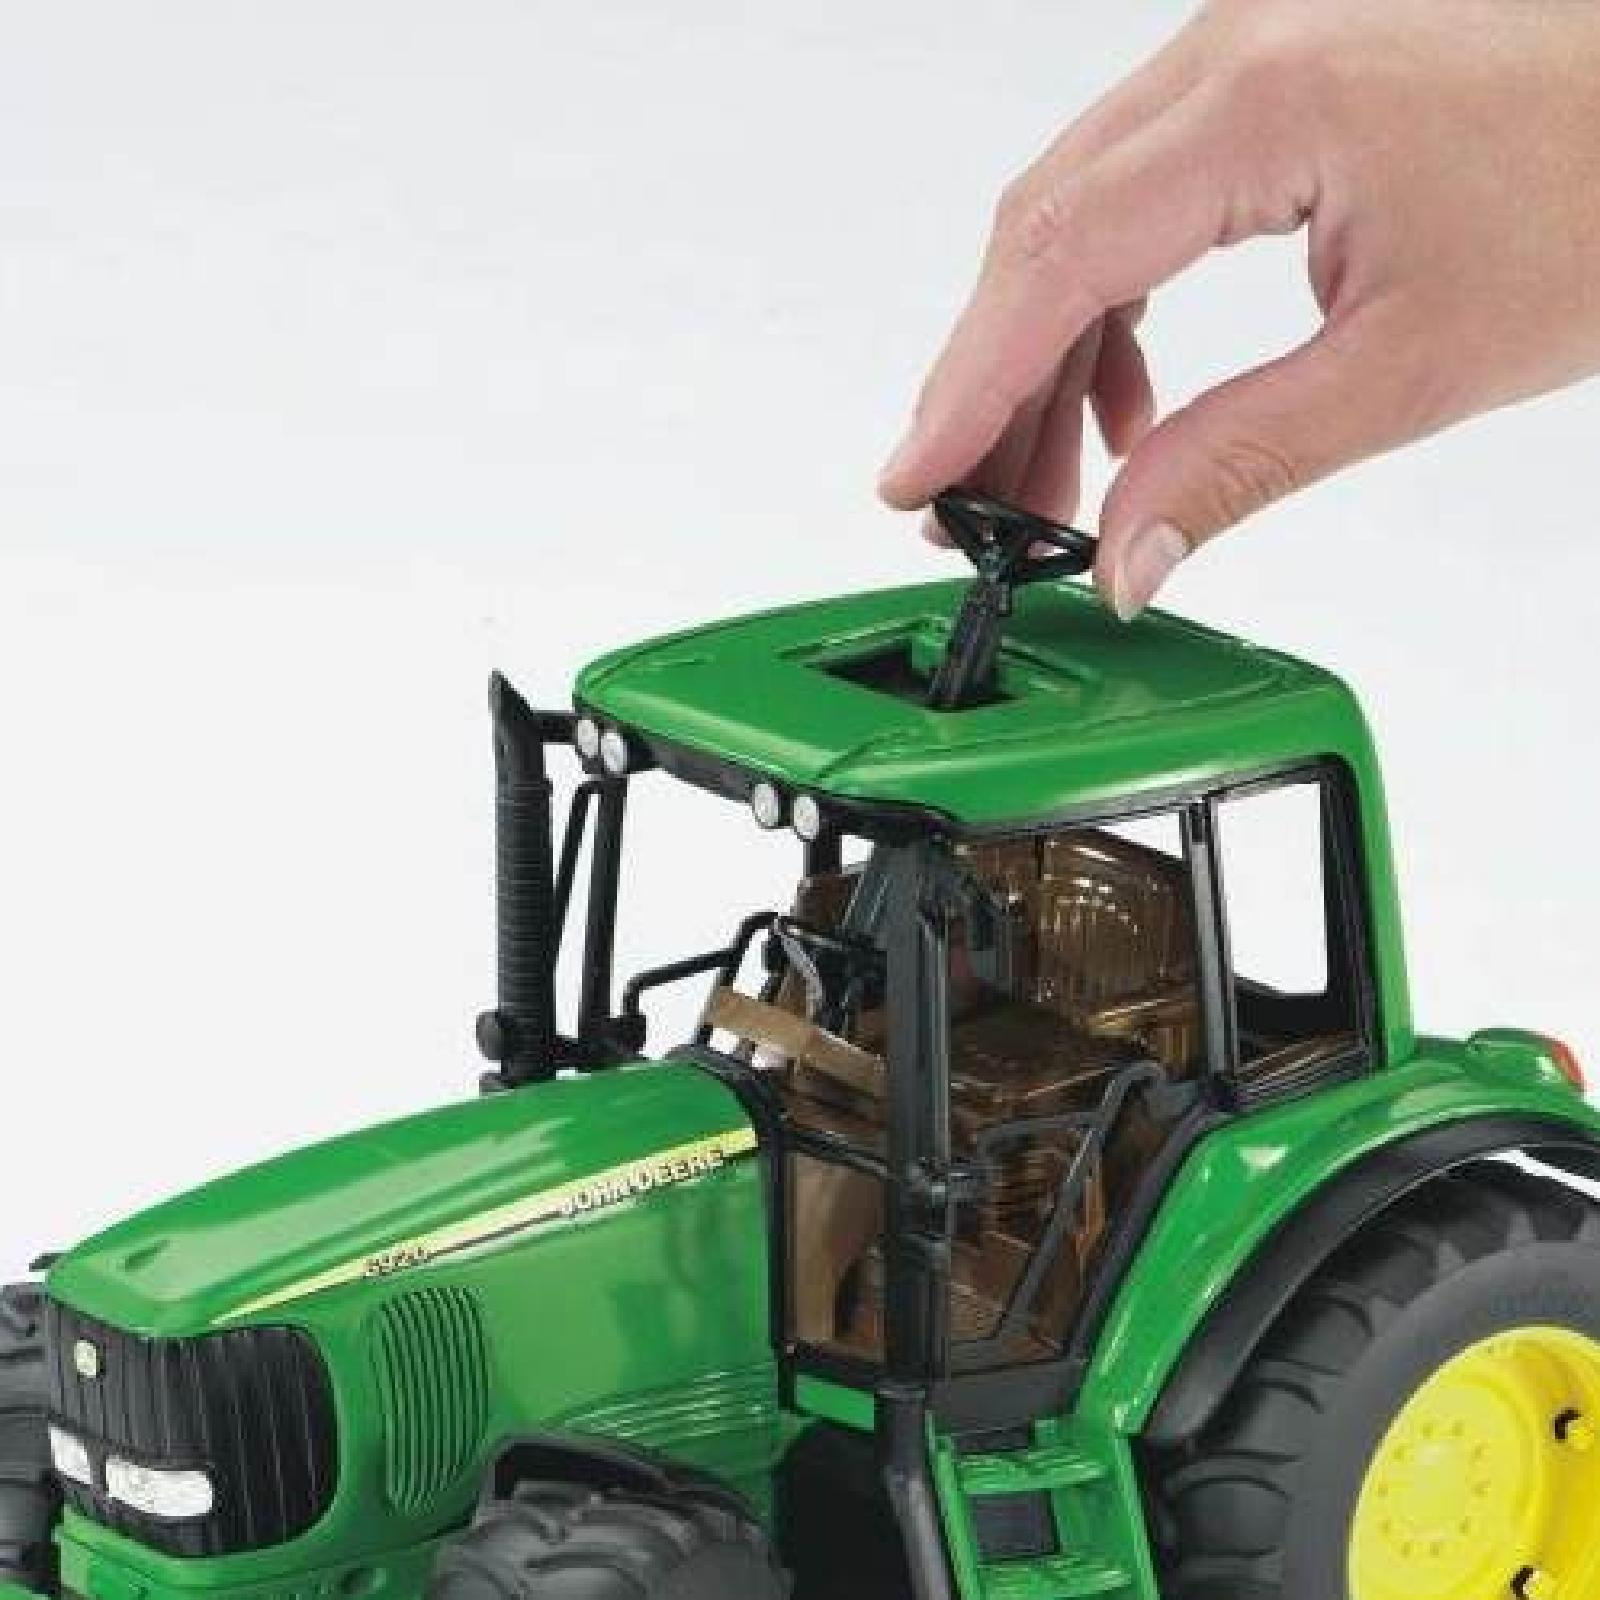 Bruder Toys 02050 Pro Series John Deere 6920 Tractor Toy Model 1:16 ...